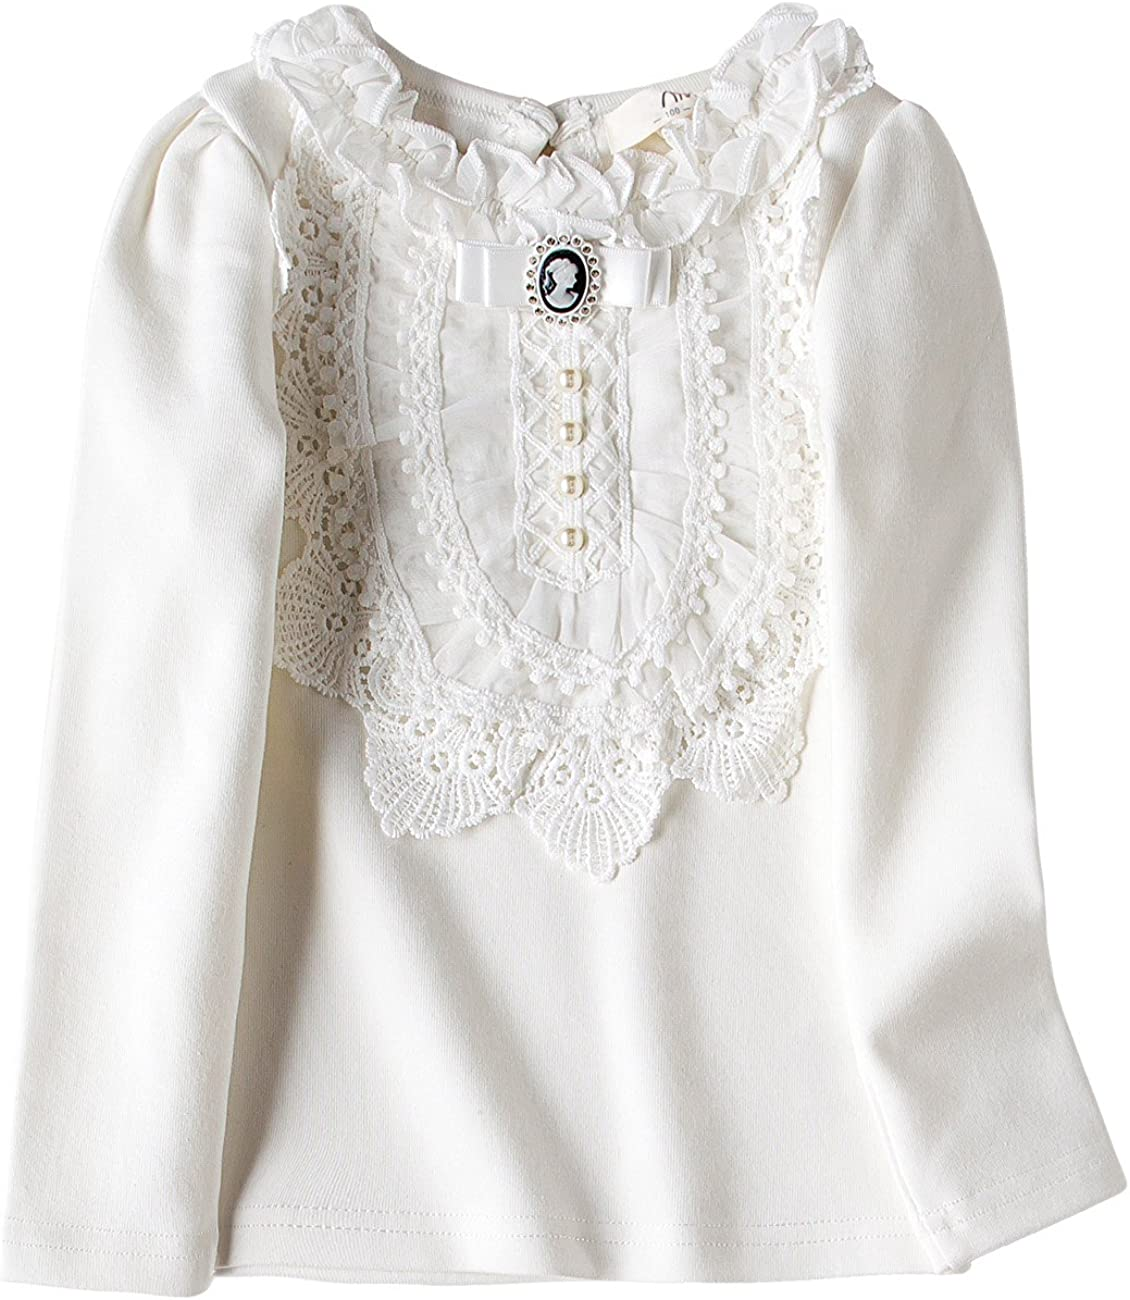 I Score Them Cotton Toddler Long Sleeve Ruffle Shirt Top Soccer I Dont